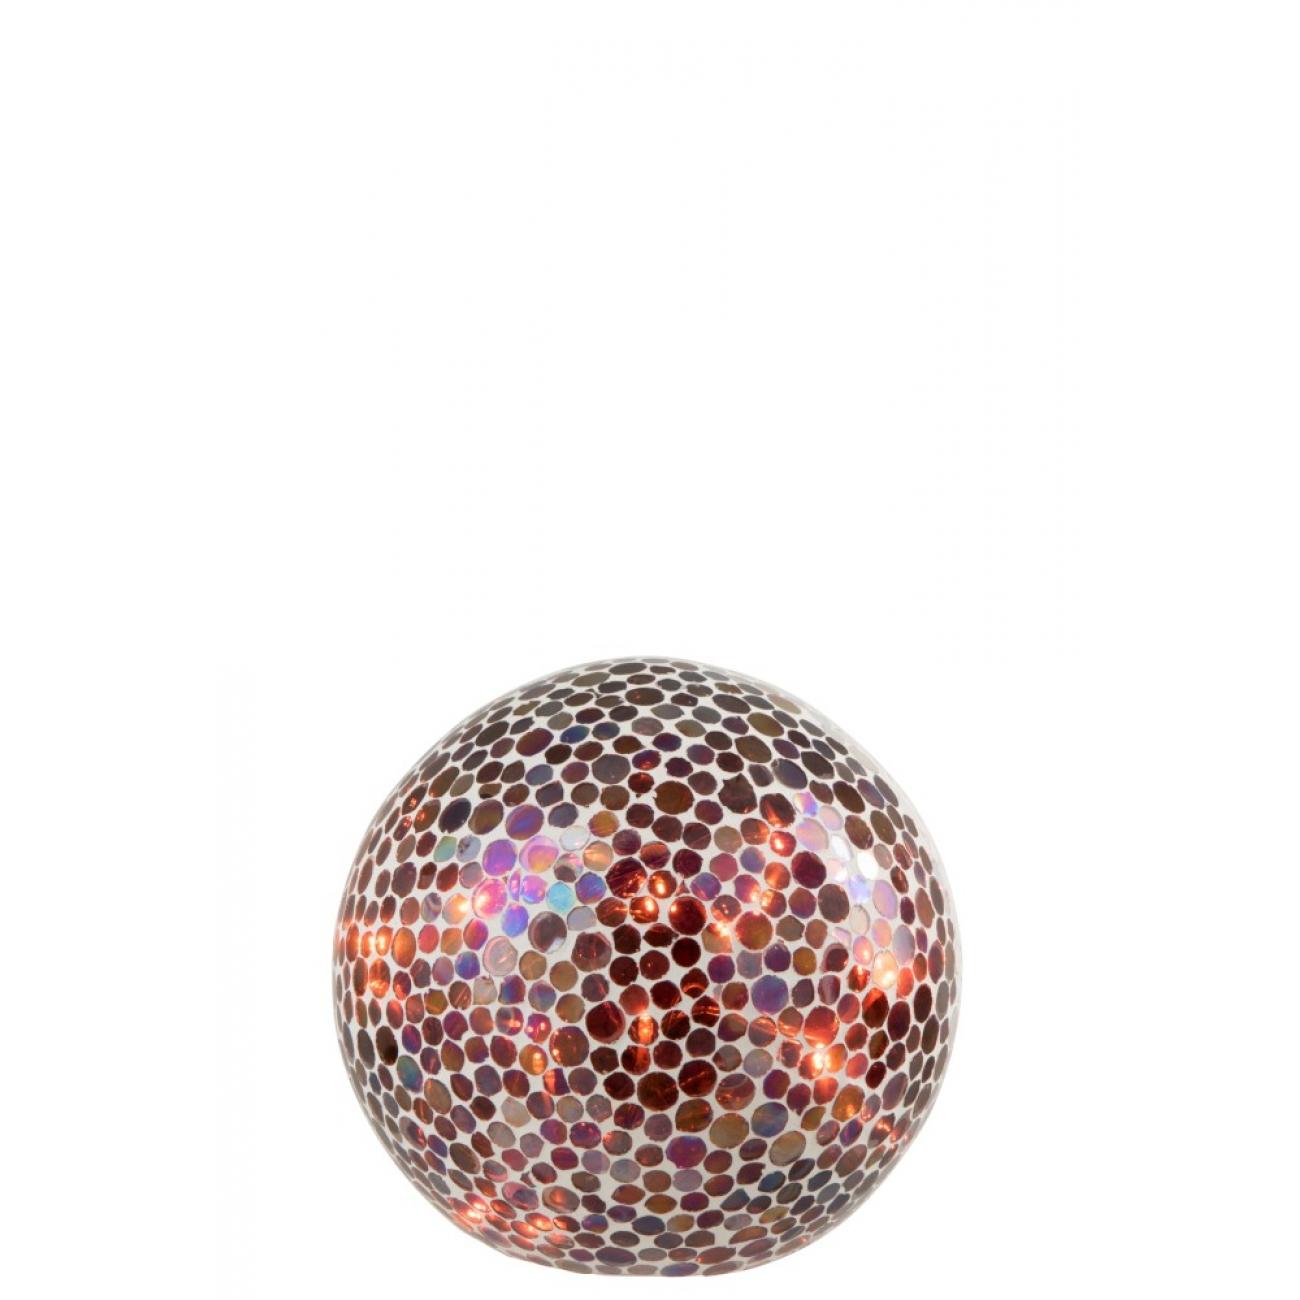 Ночник  J-LINE лед лампа в форме мозаичного шара диаметр 20 см